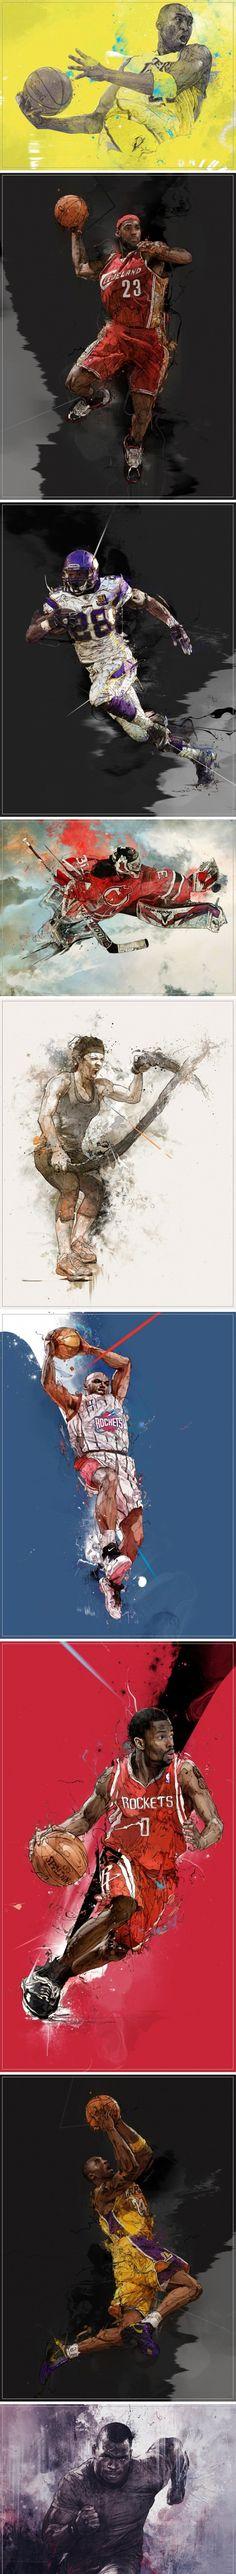 Sport Illustrations 나이키 일러스트 광고